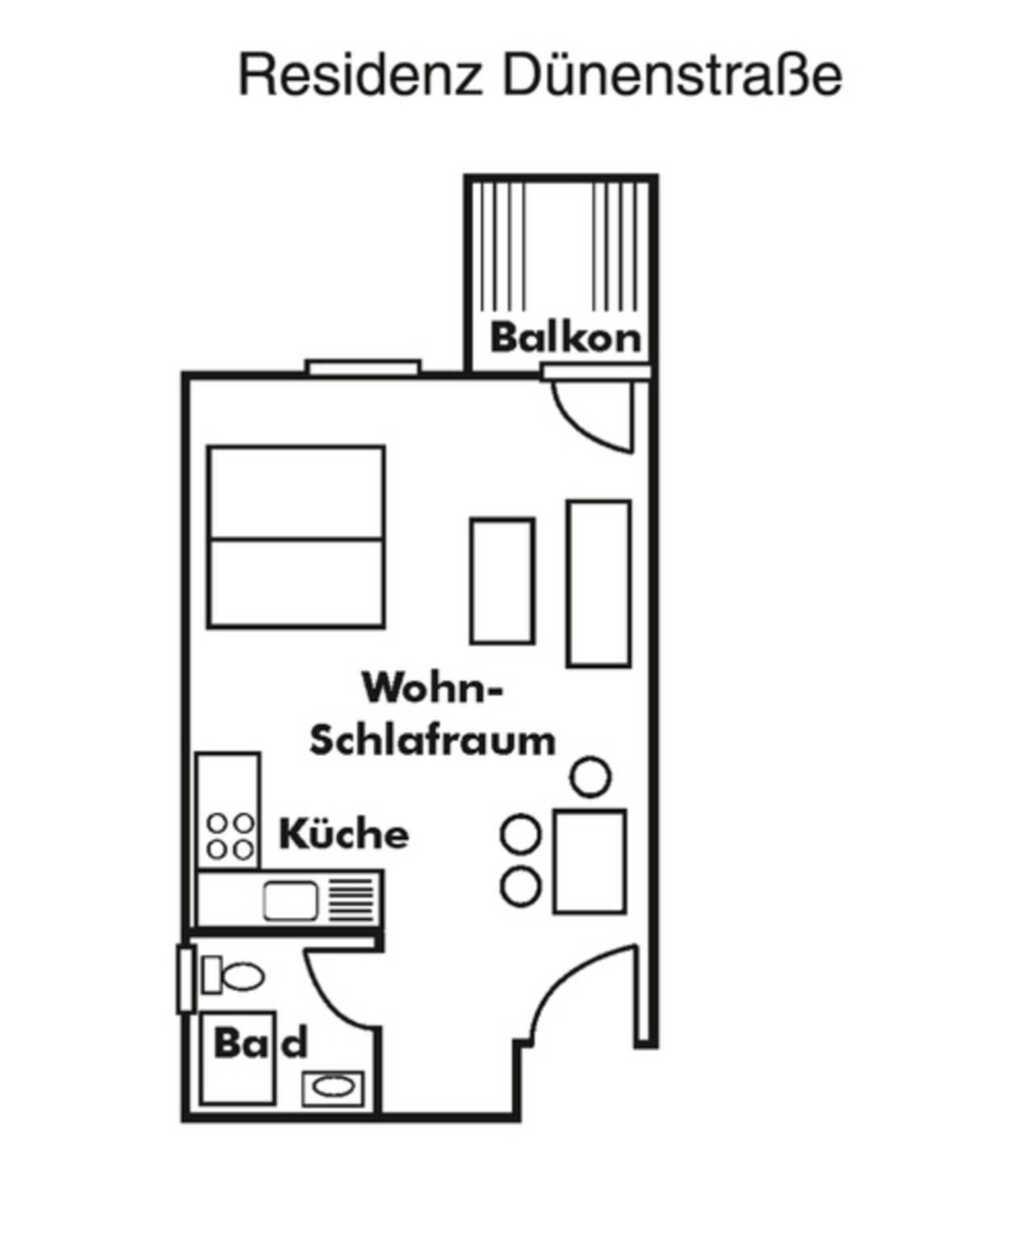 Residenz Dünenstraße, Residenz - App. Nr. 17